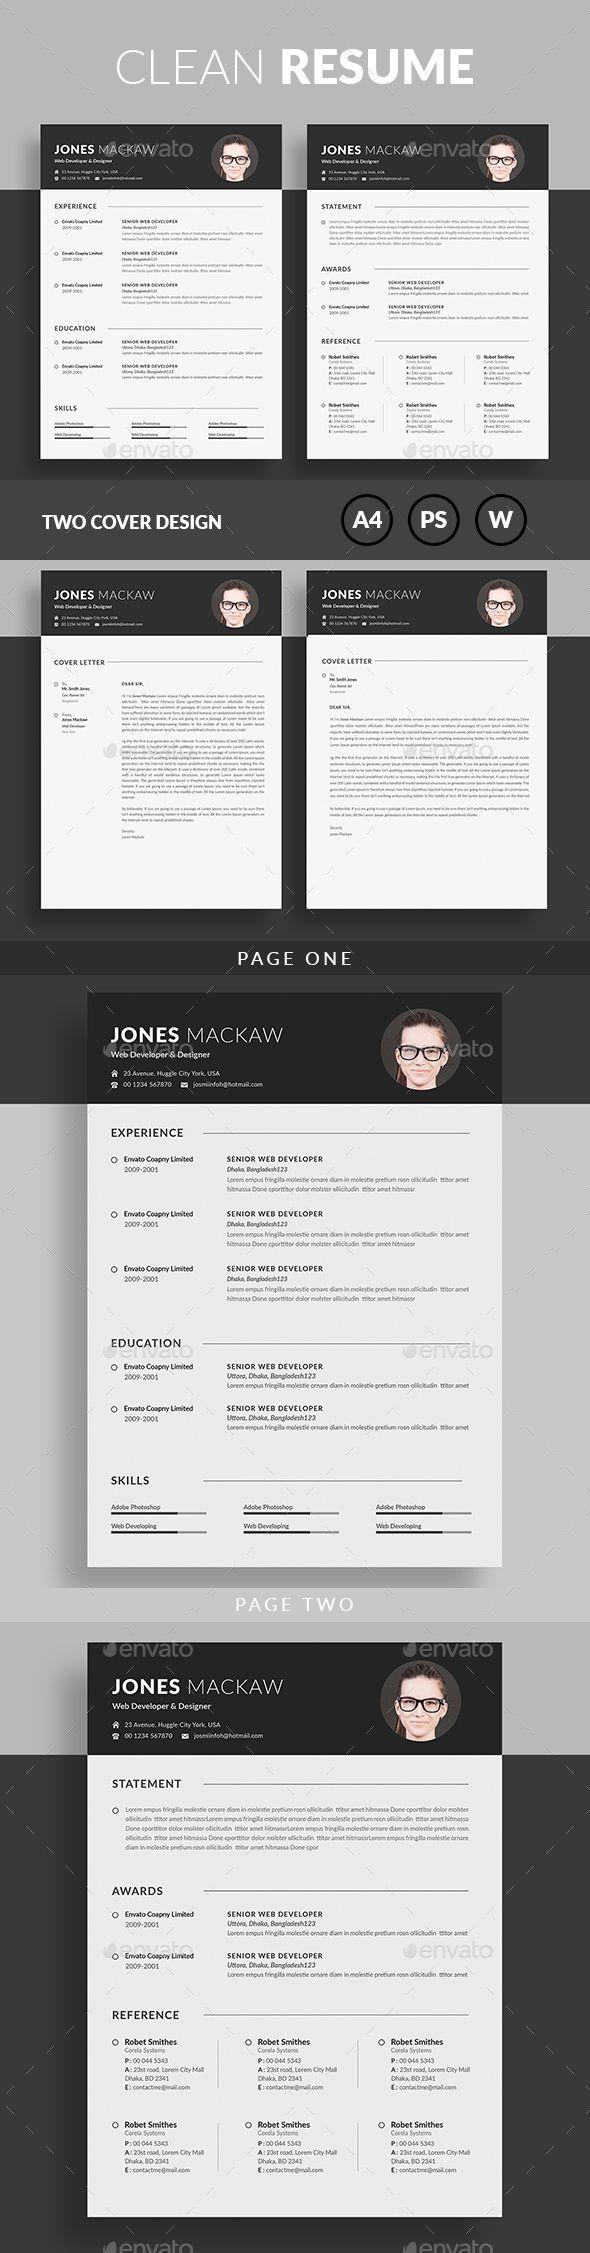 24 best Cv images on Pinterest | Resume design, Resume templates ...